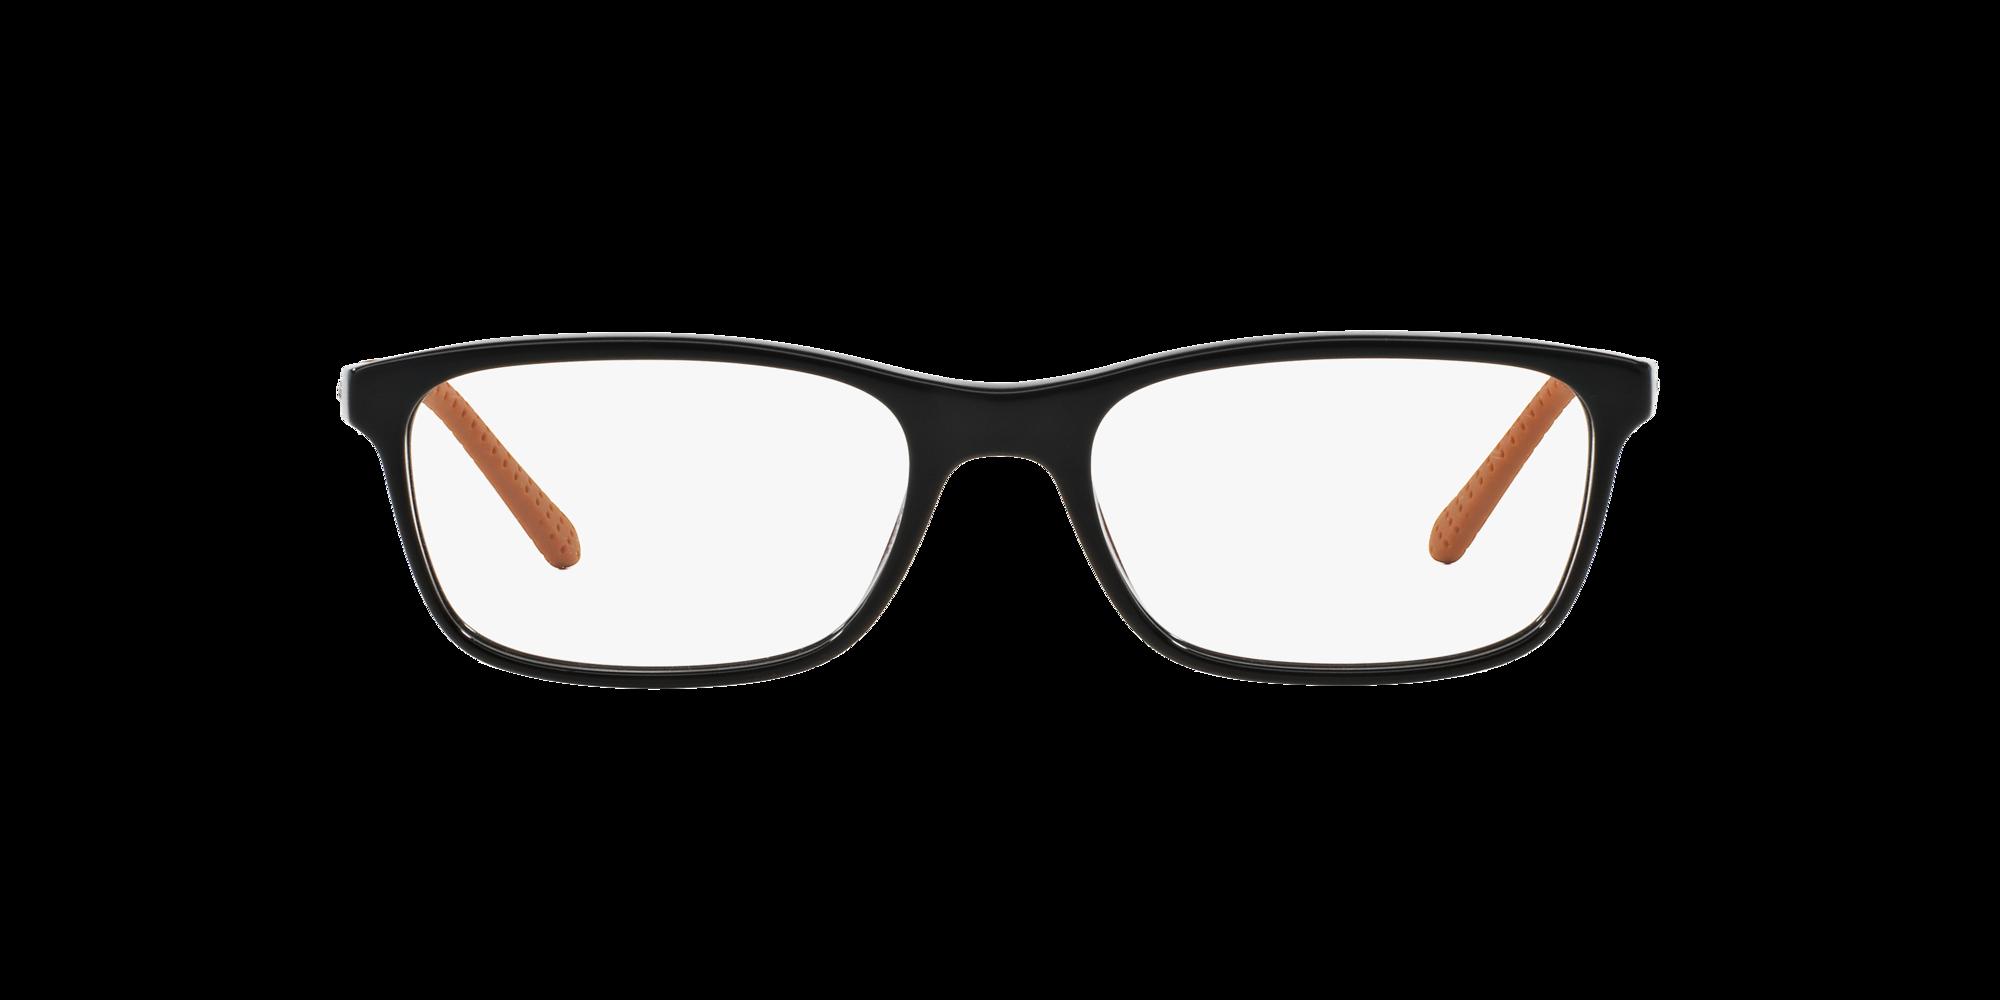 Image for RL6134 from LensCrafters | Glasses, Prescription Glasses Online, Eyewear